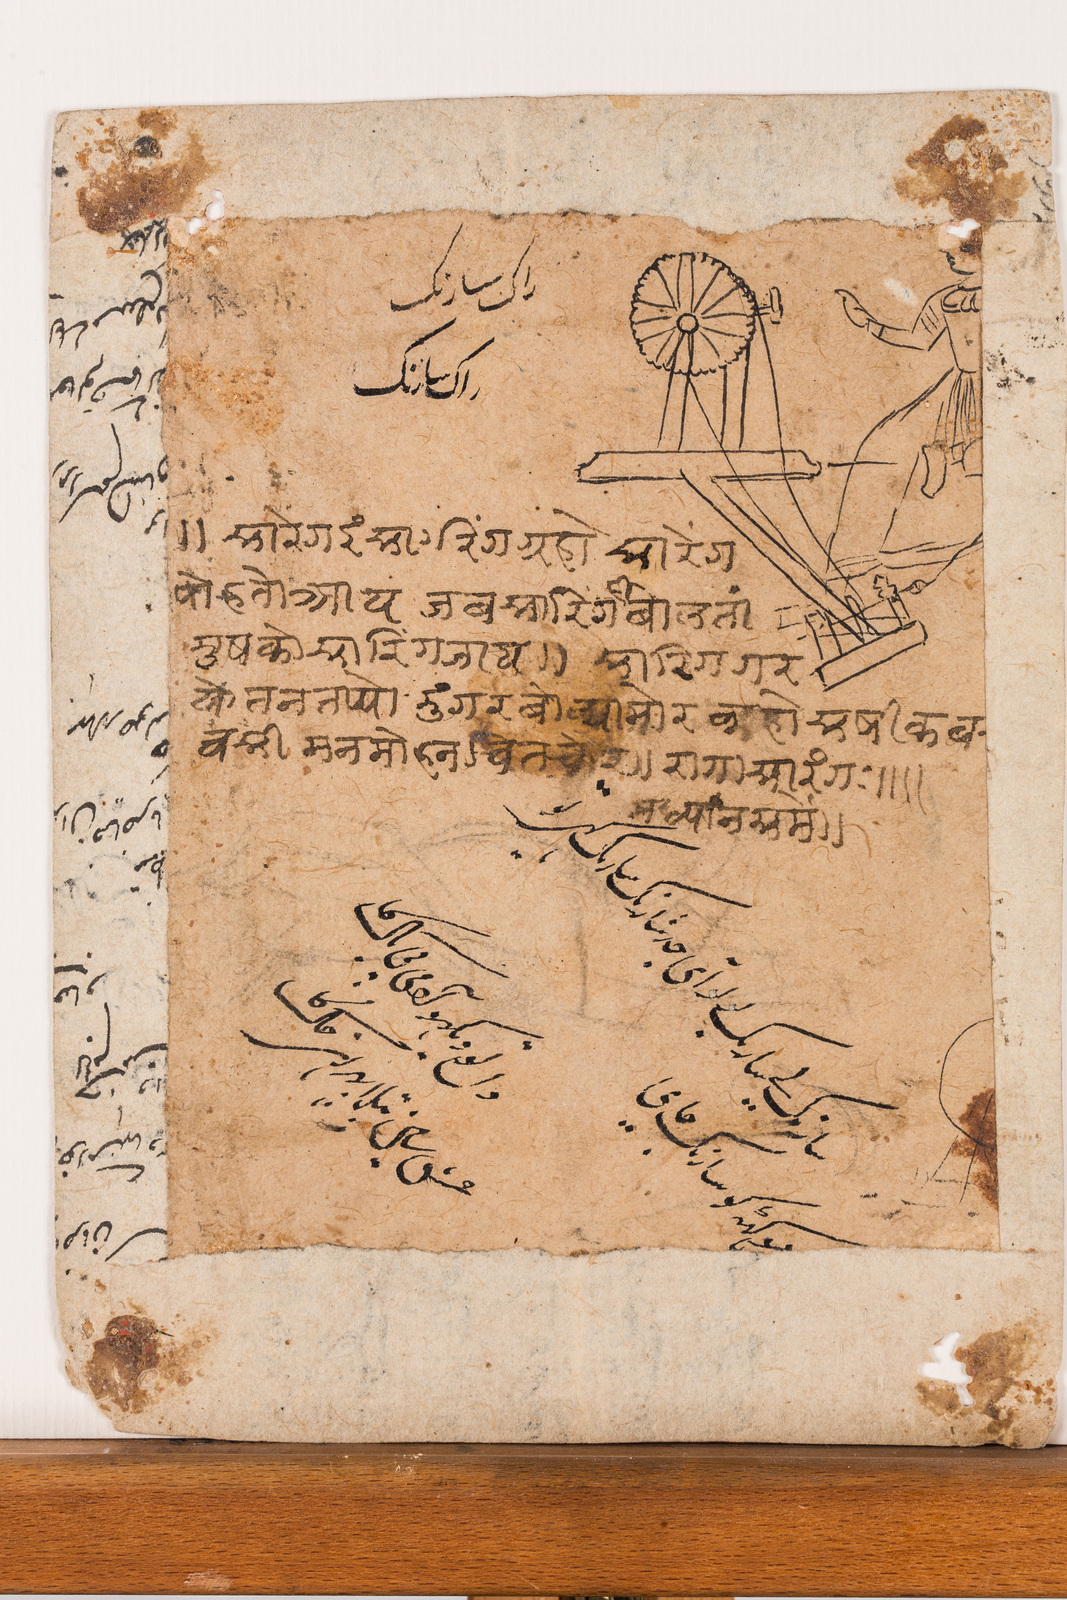 INDIA - Image 6 of 6